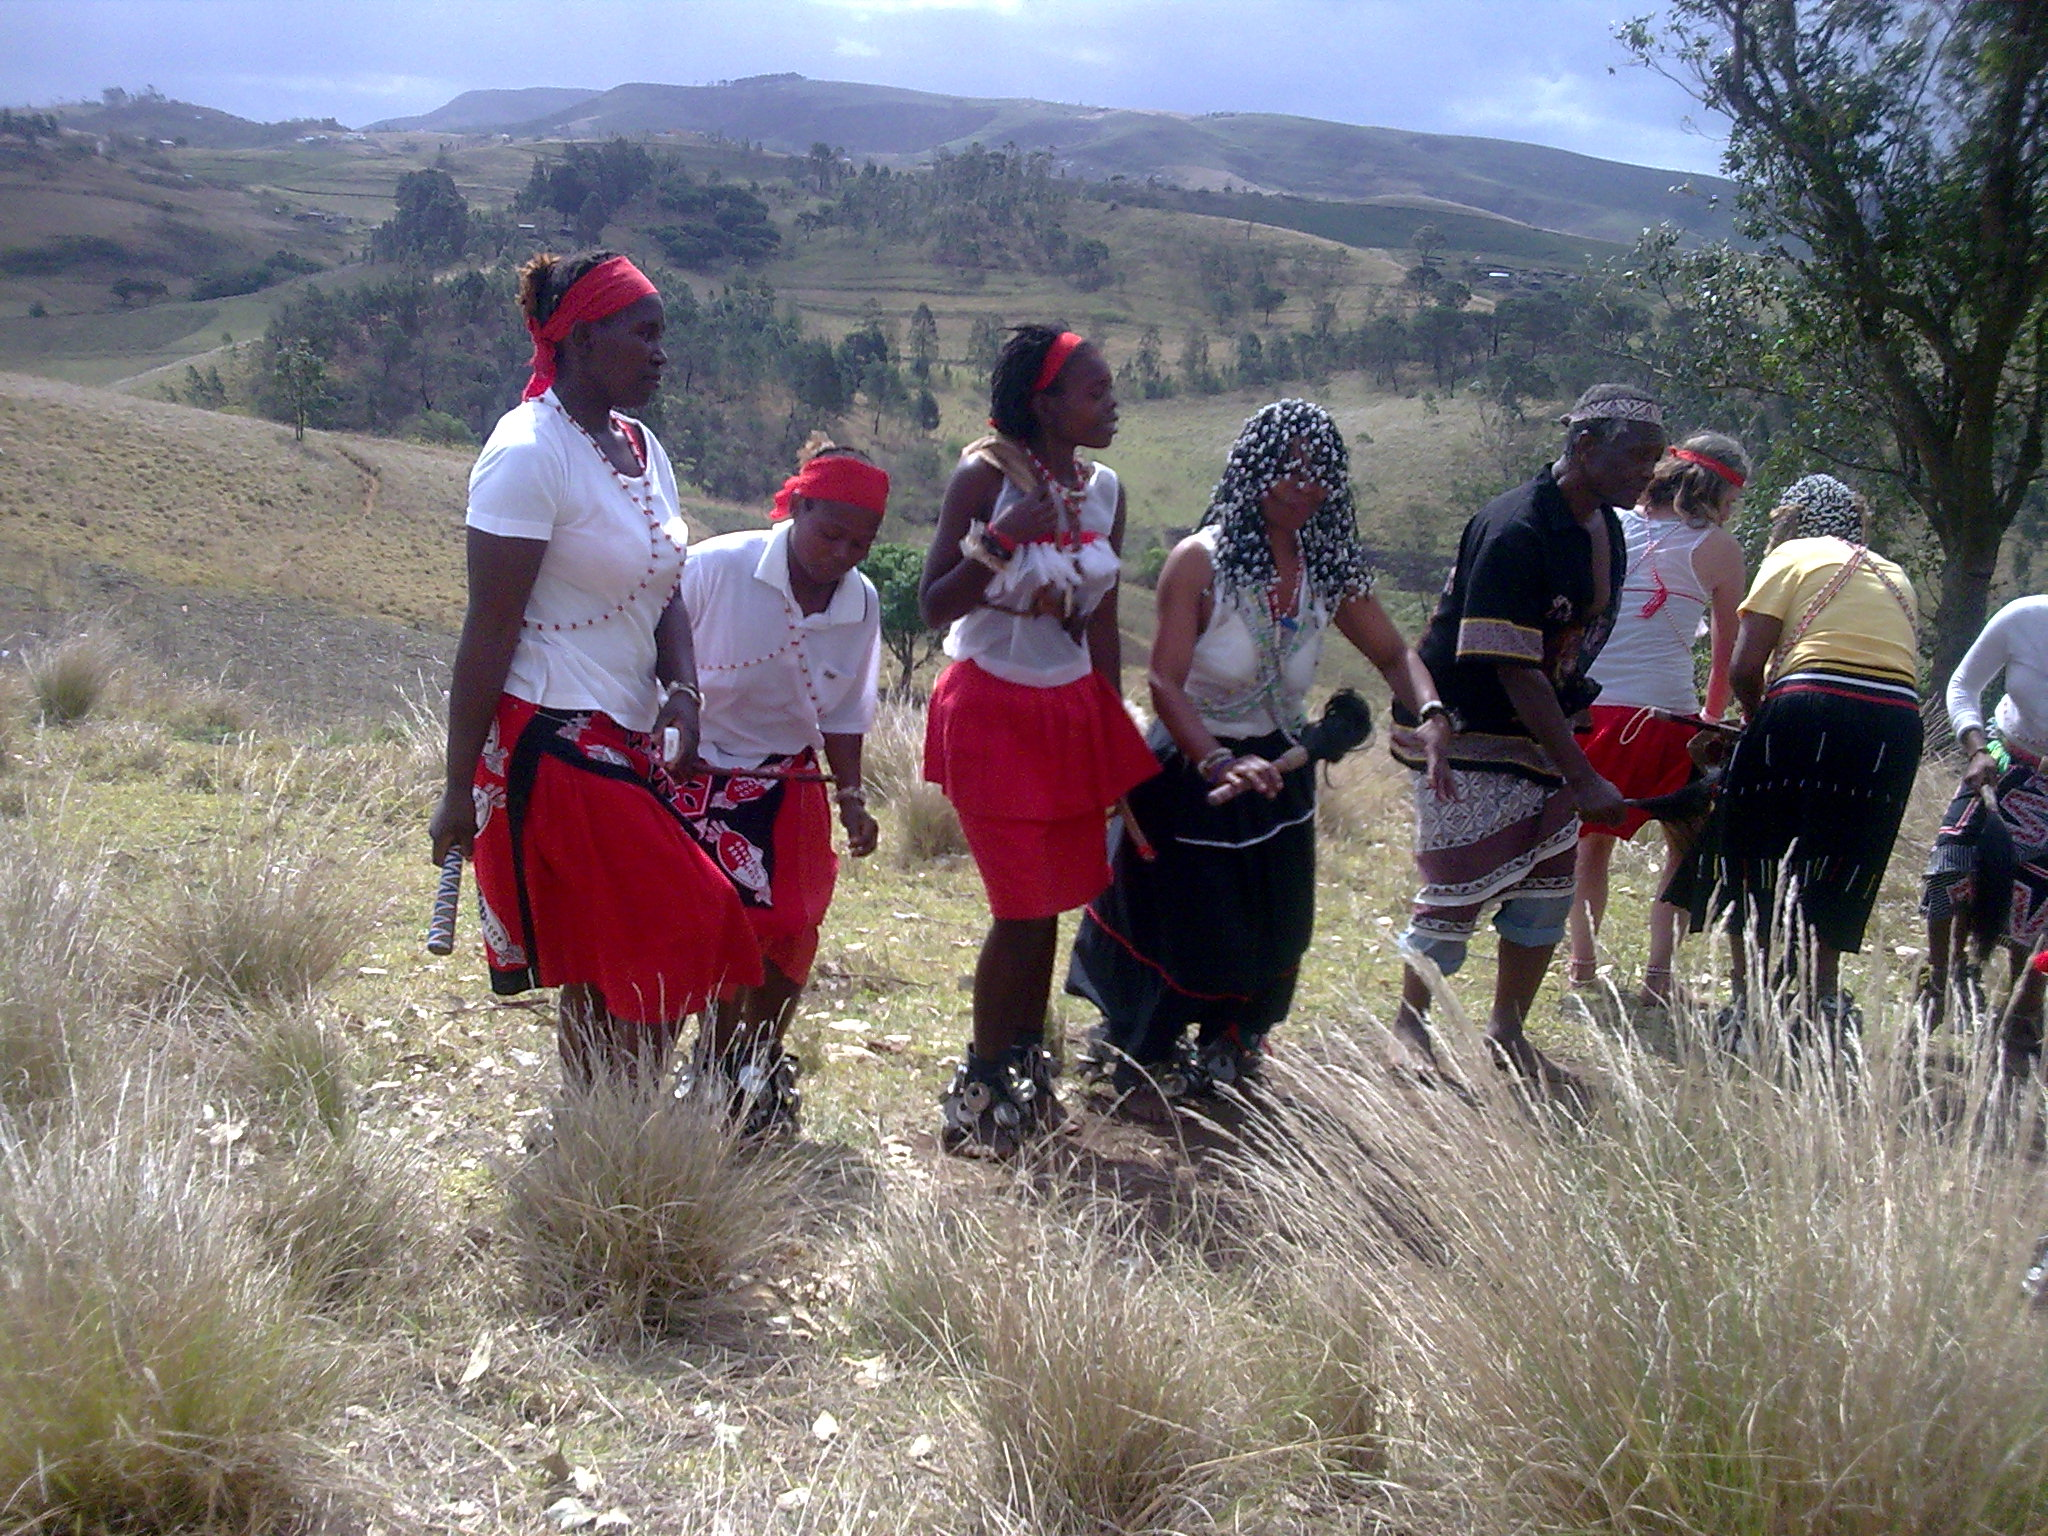 Annual Sangoma ceremony in Zululand /static/Zulu/Image039.jpg